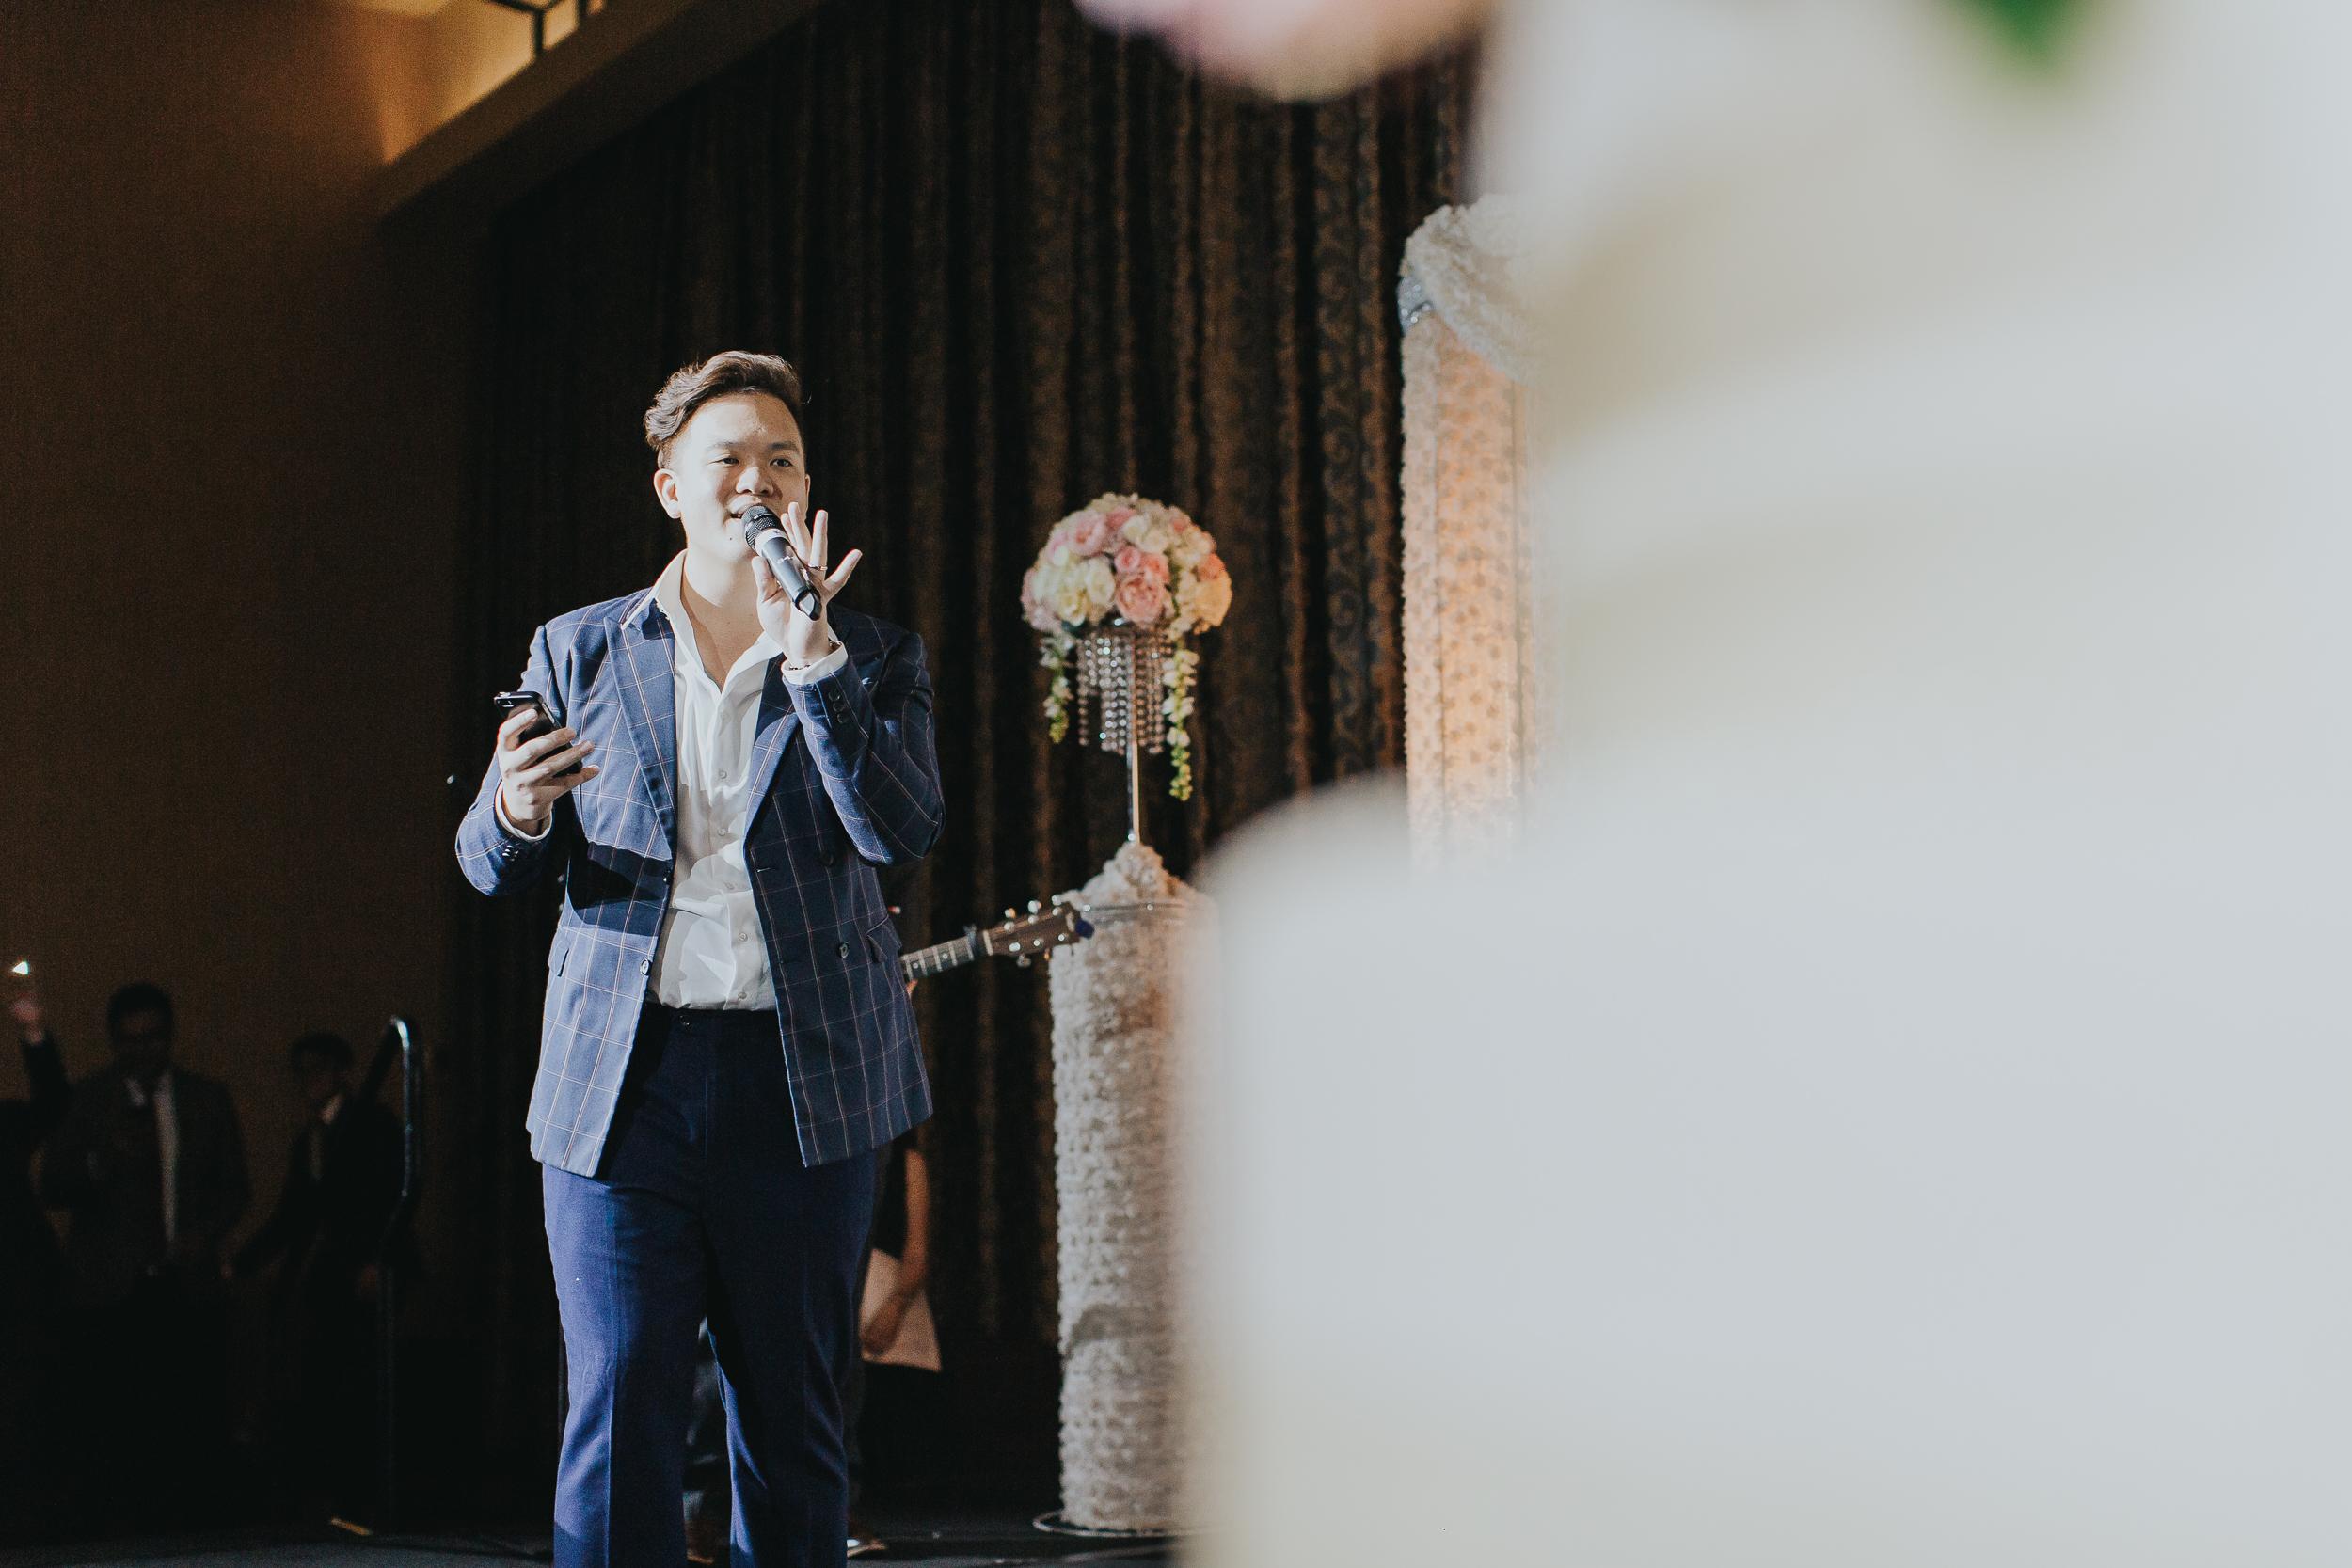 Singapore+Actual+Day+Wedding+Photographer+Grand+Mercure+Oliver+Estelle-0112.jpg